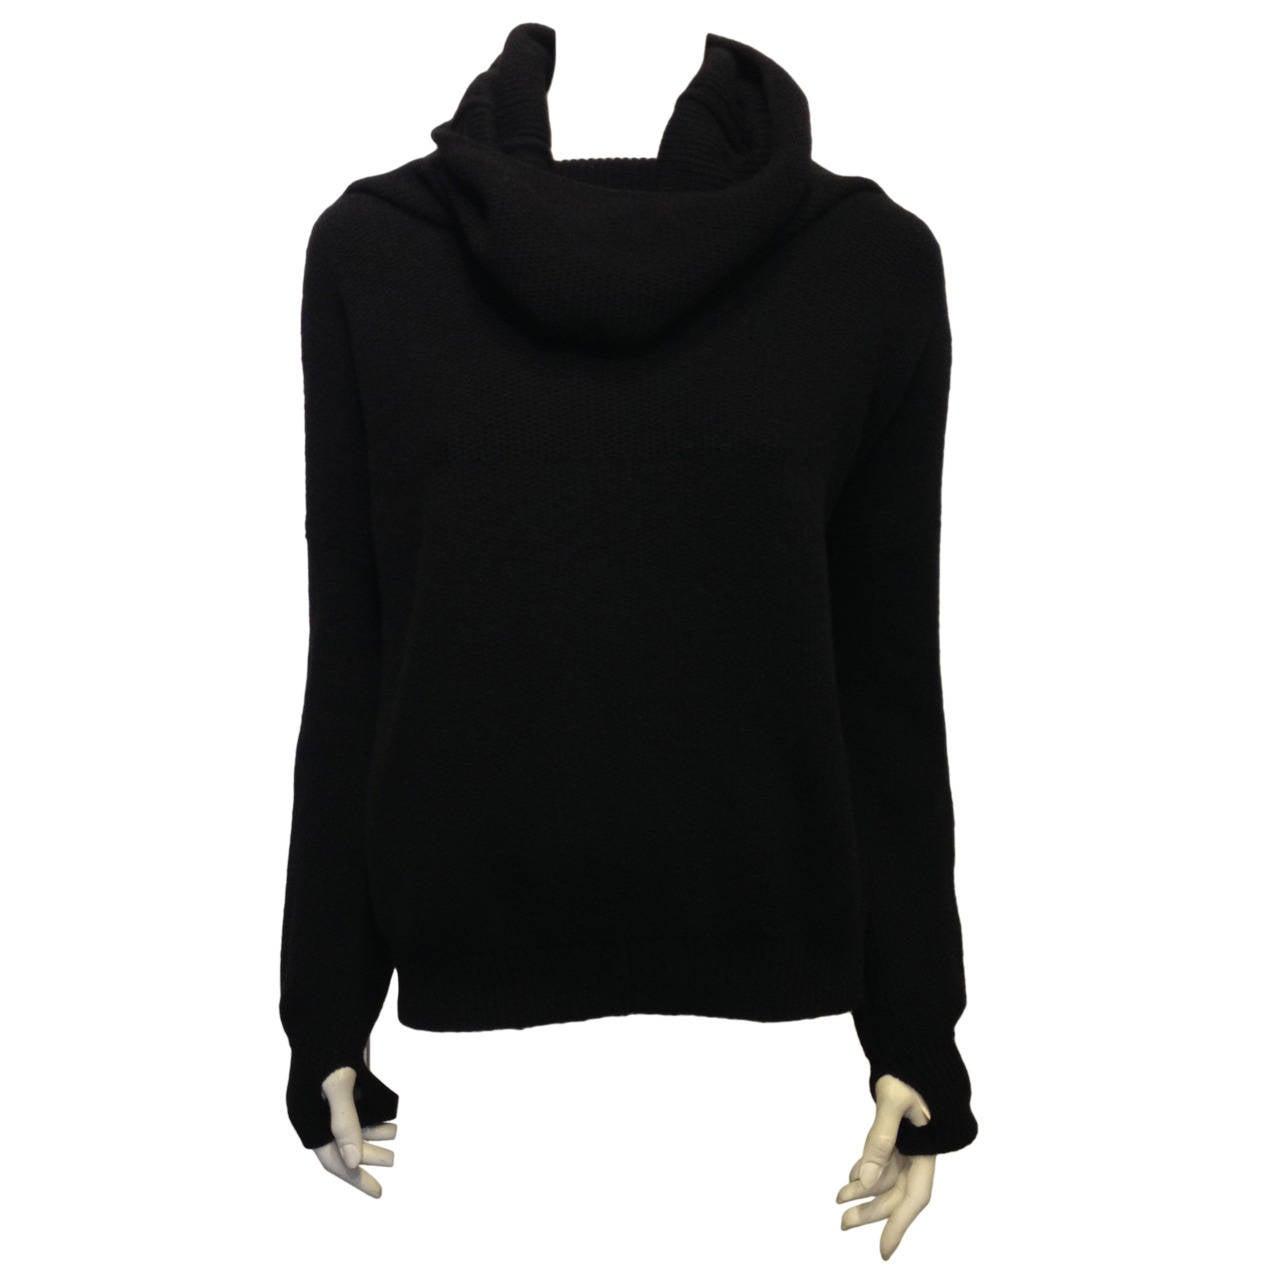 Hermes Black Turtleneck Sweater 1